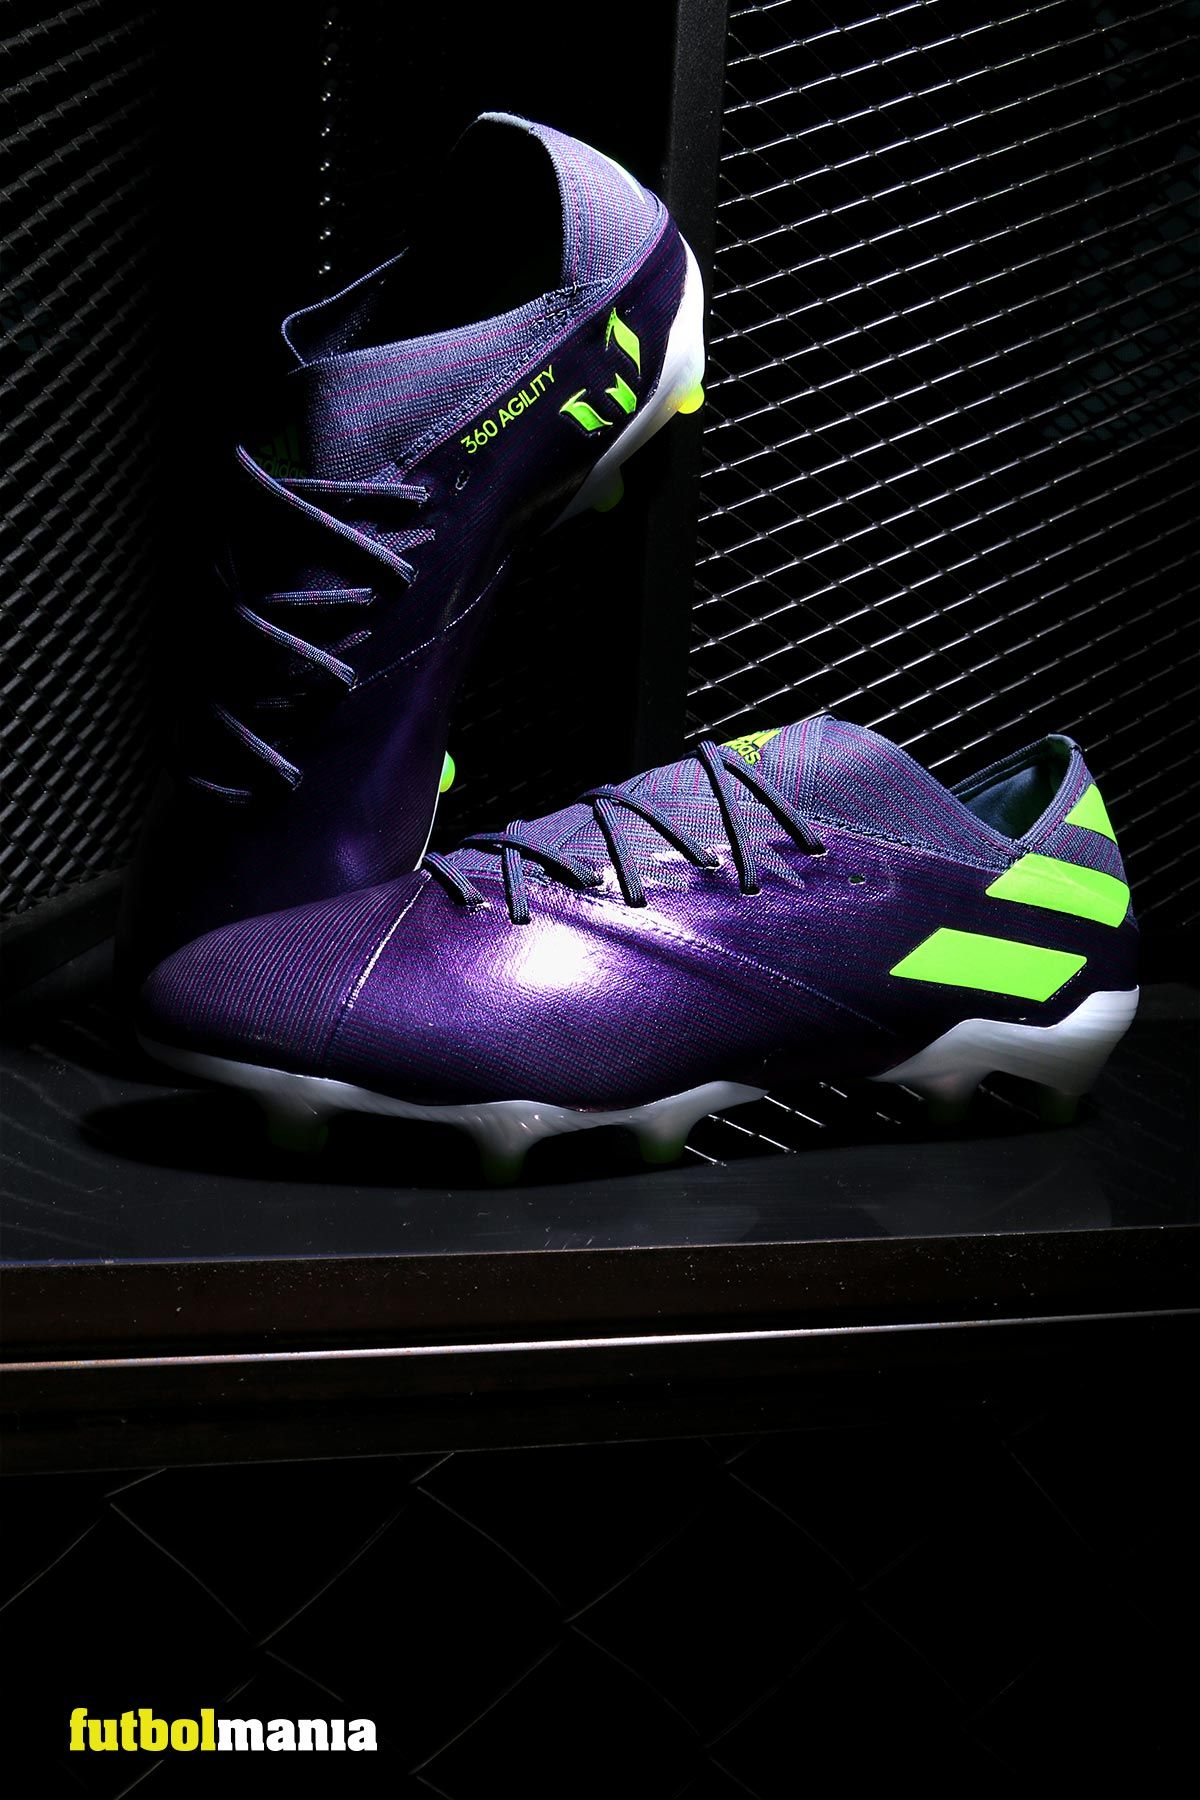 adidas Nemeziz Messi 19.1 FG | Chaussure